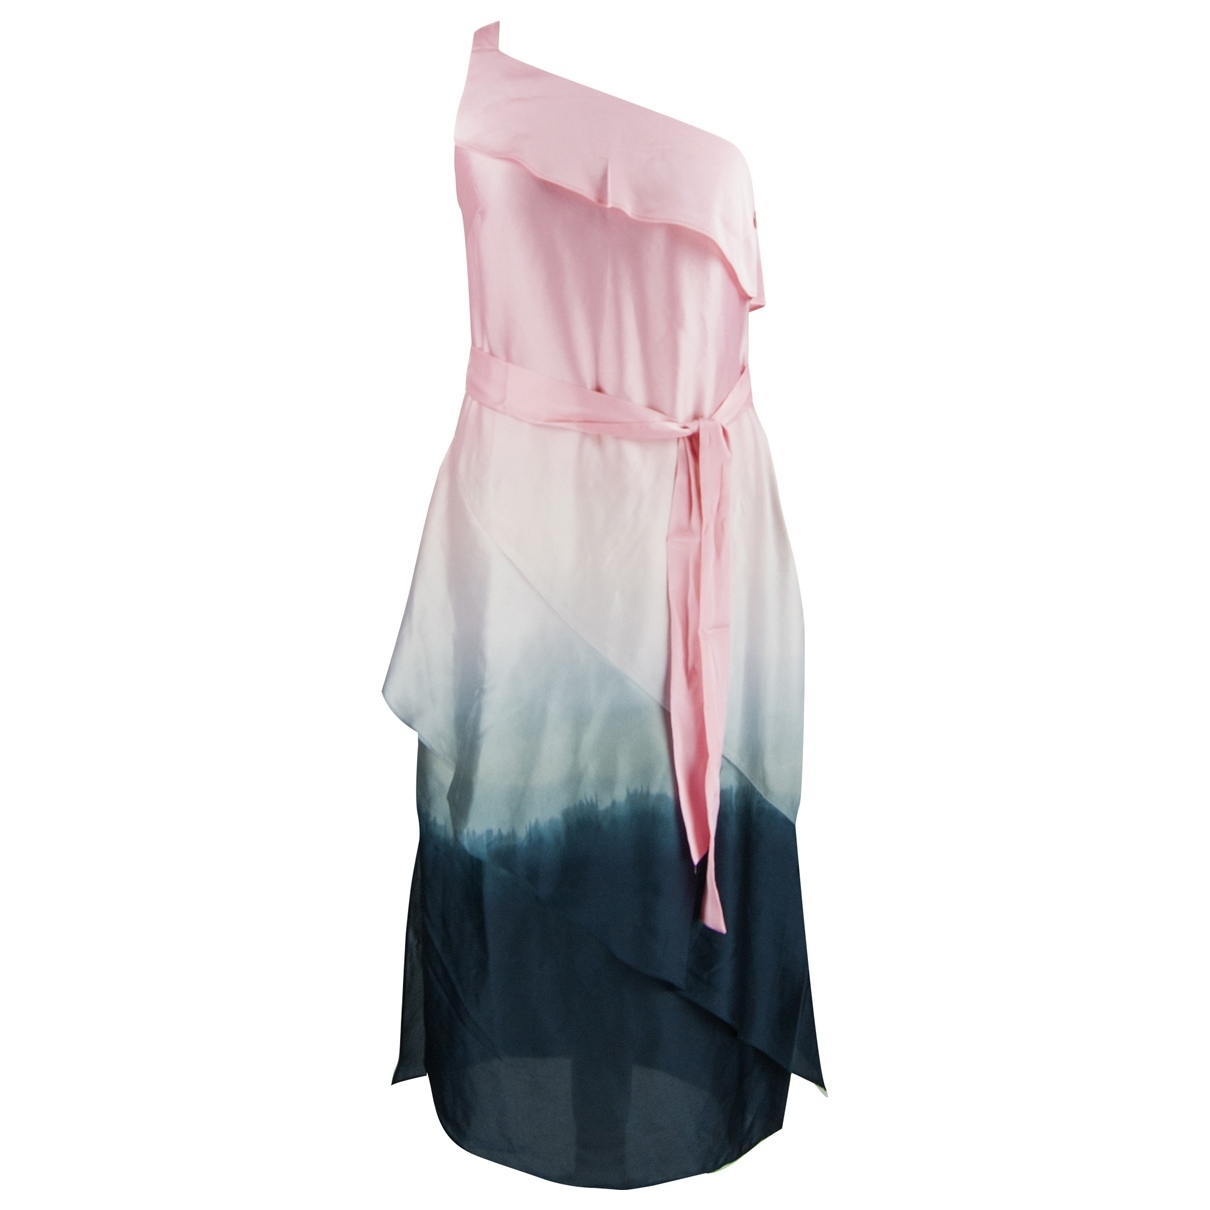 Banana Republic \N Pink dress for Women 4 US